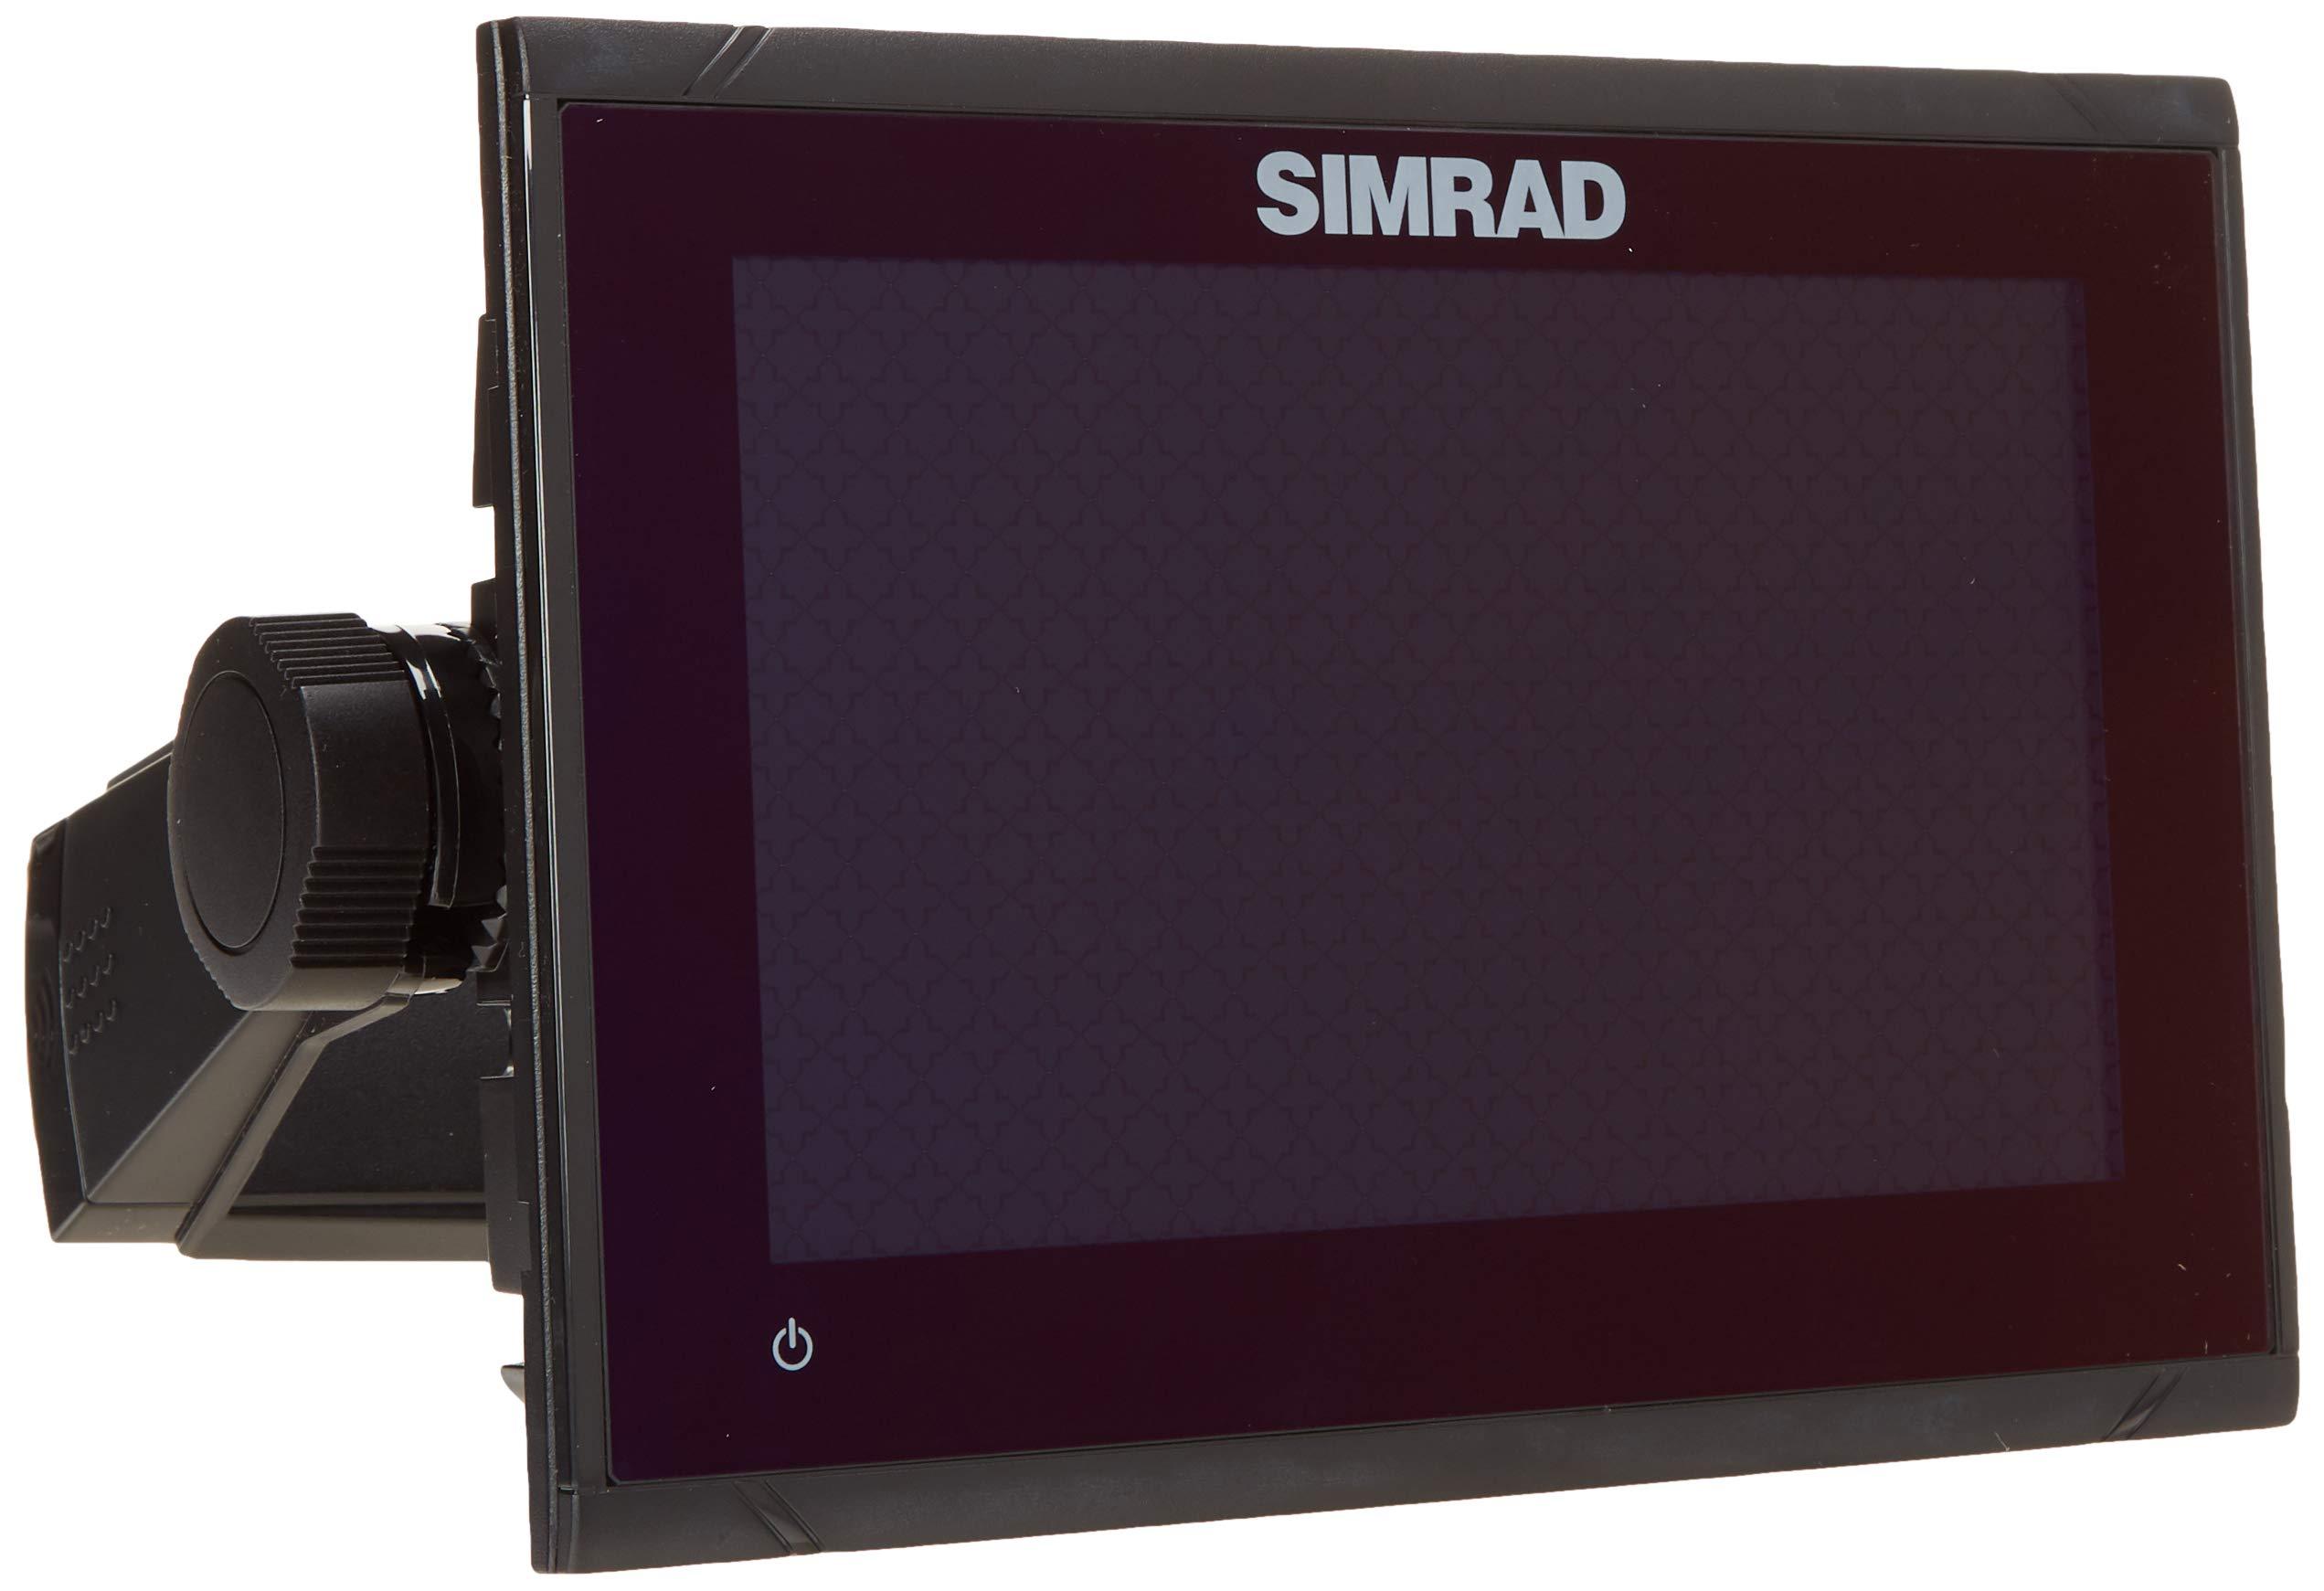 Simrad 000-14077-001 GO7 XSR Chartplotter/Fishfinder with Radar Display by Simrad